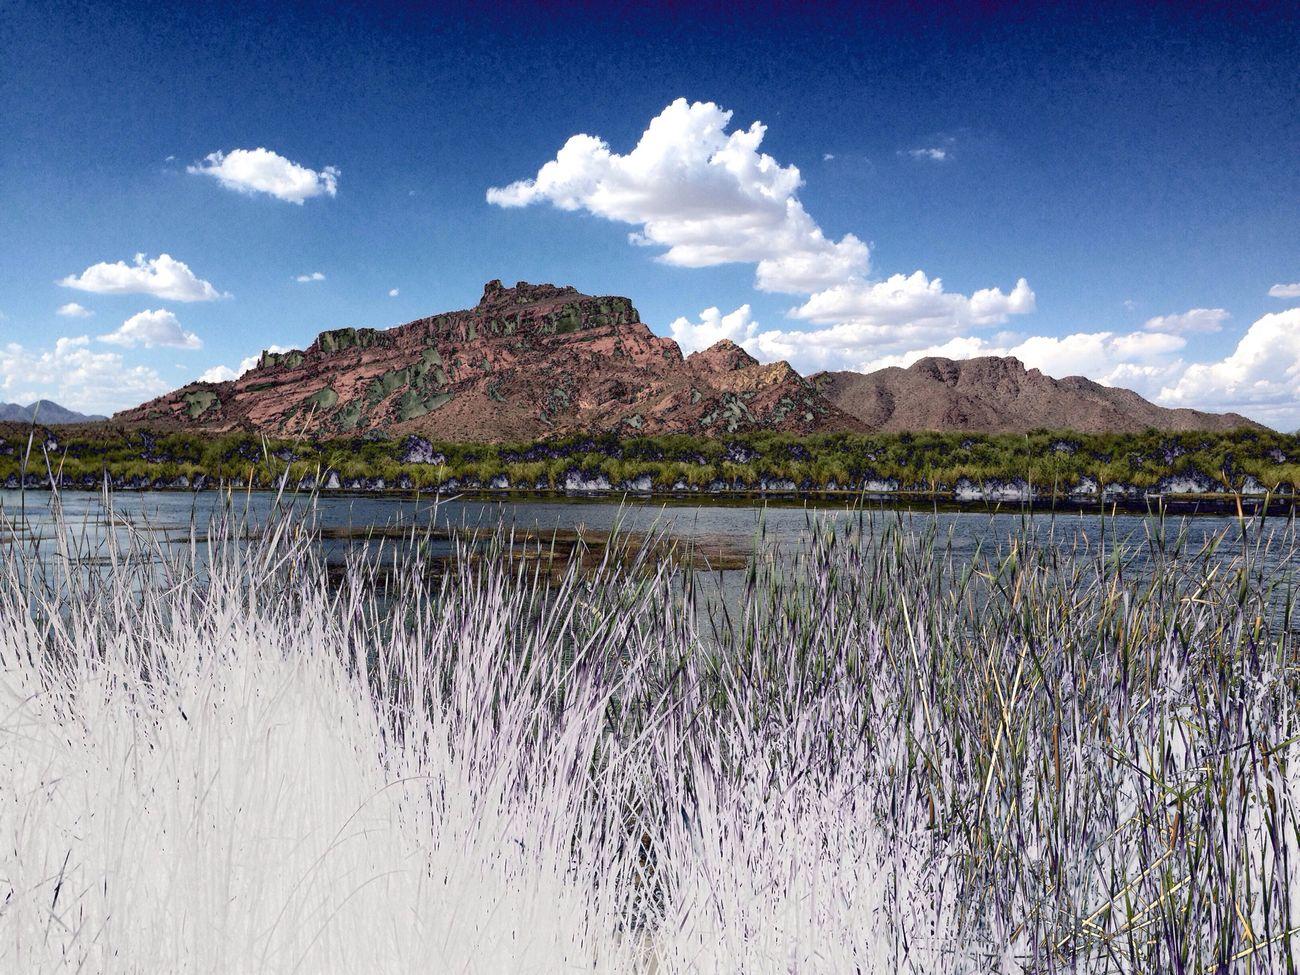 Arizona River Sunny Day Salt River Tubing